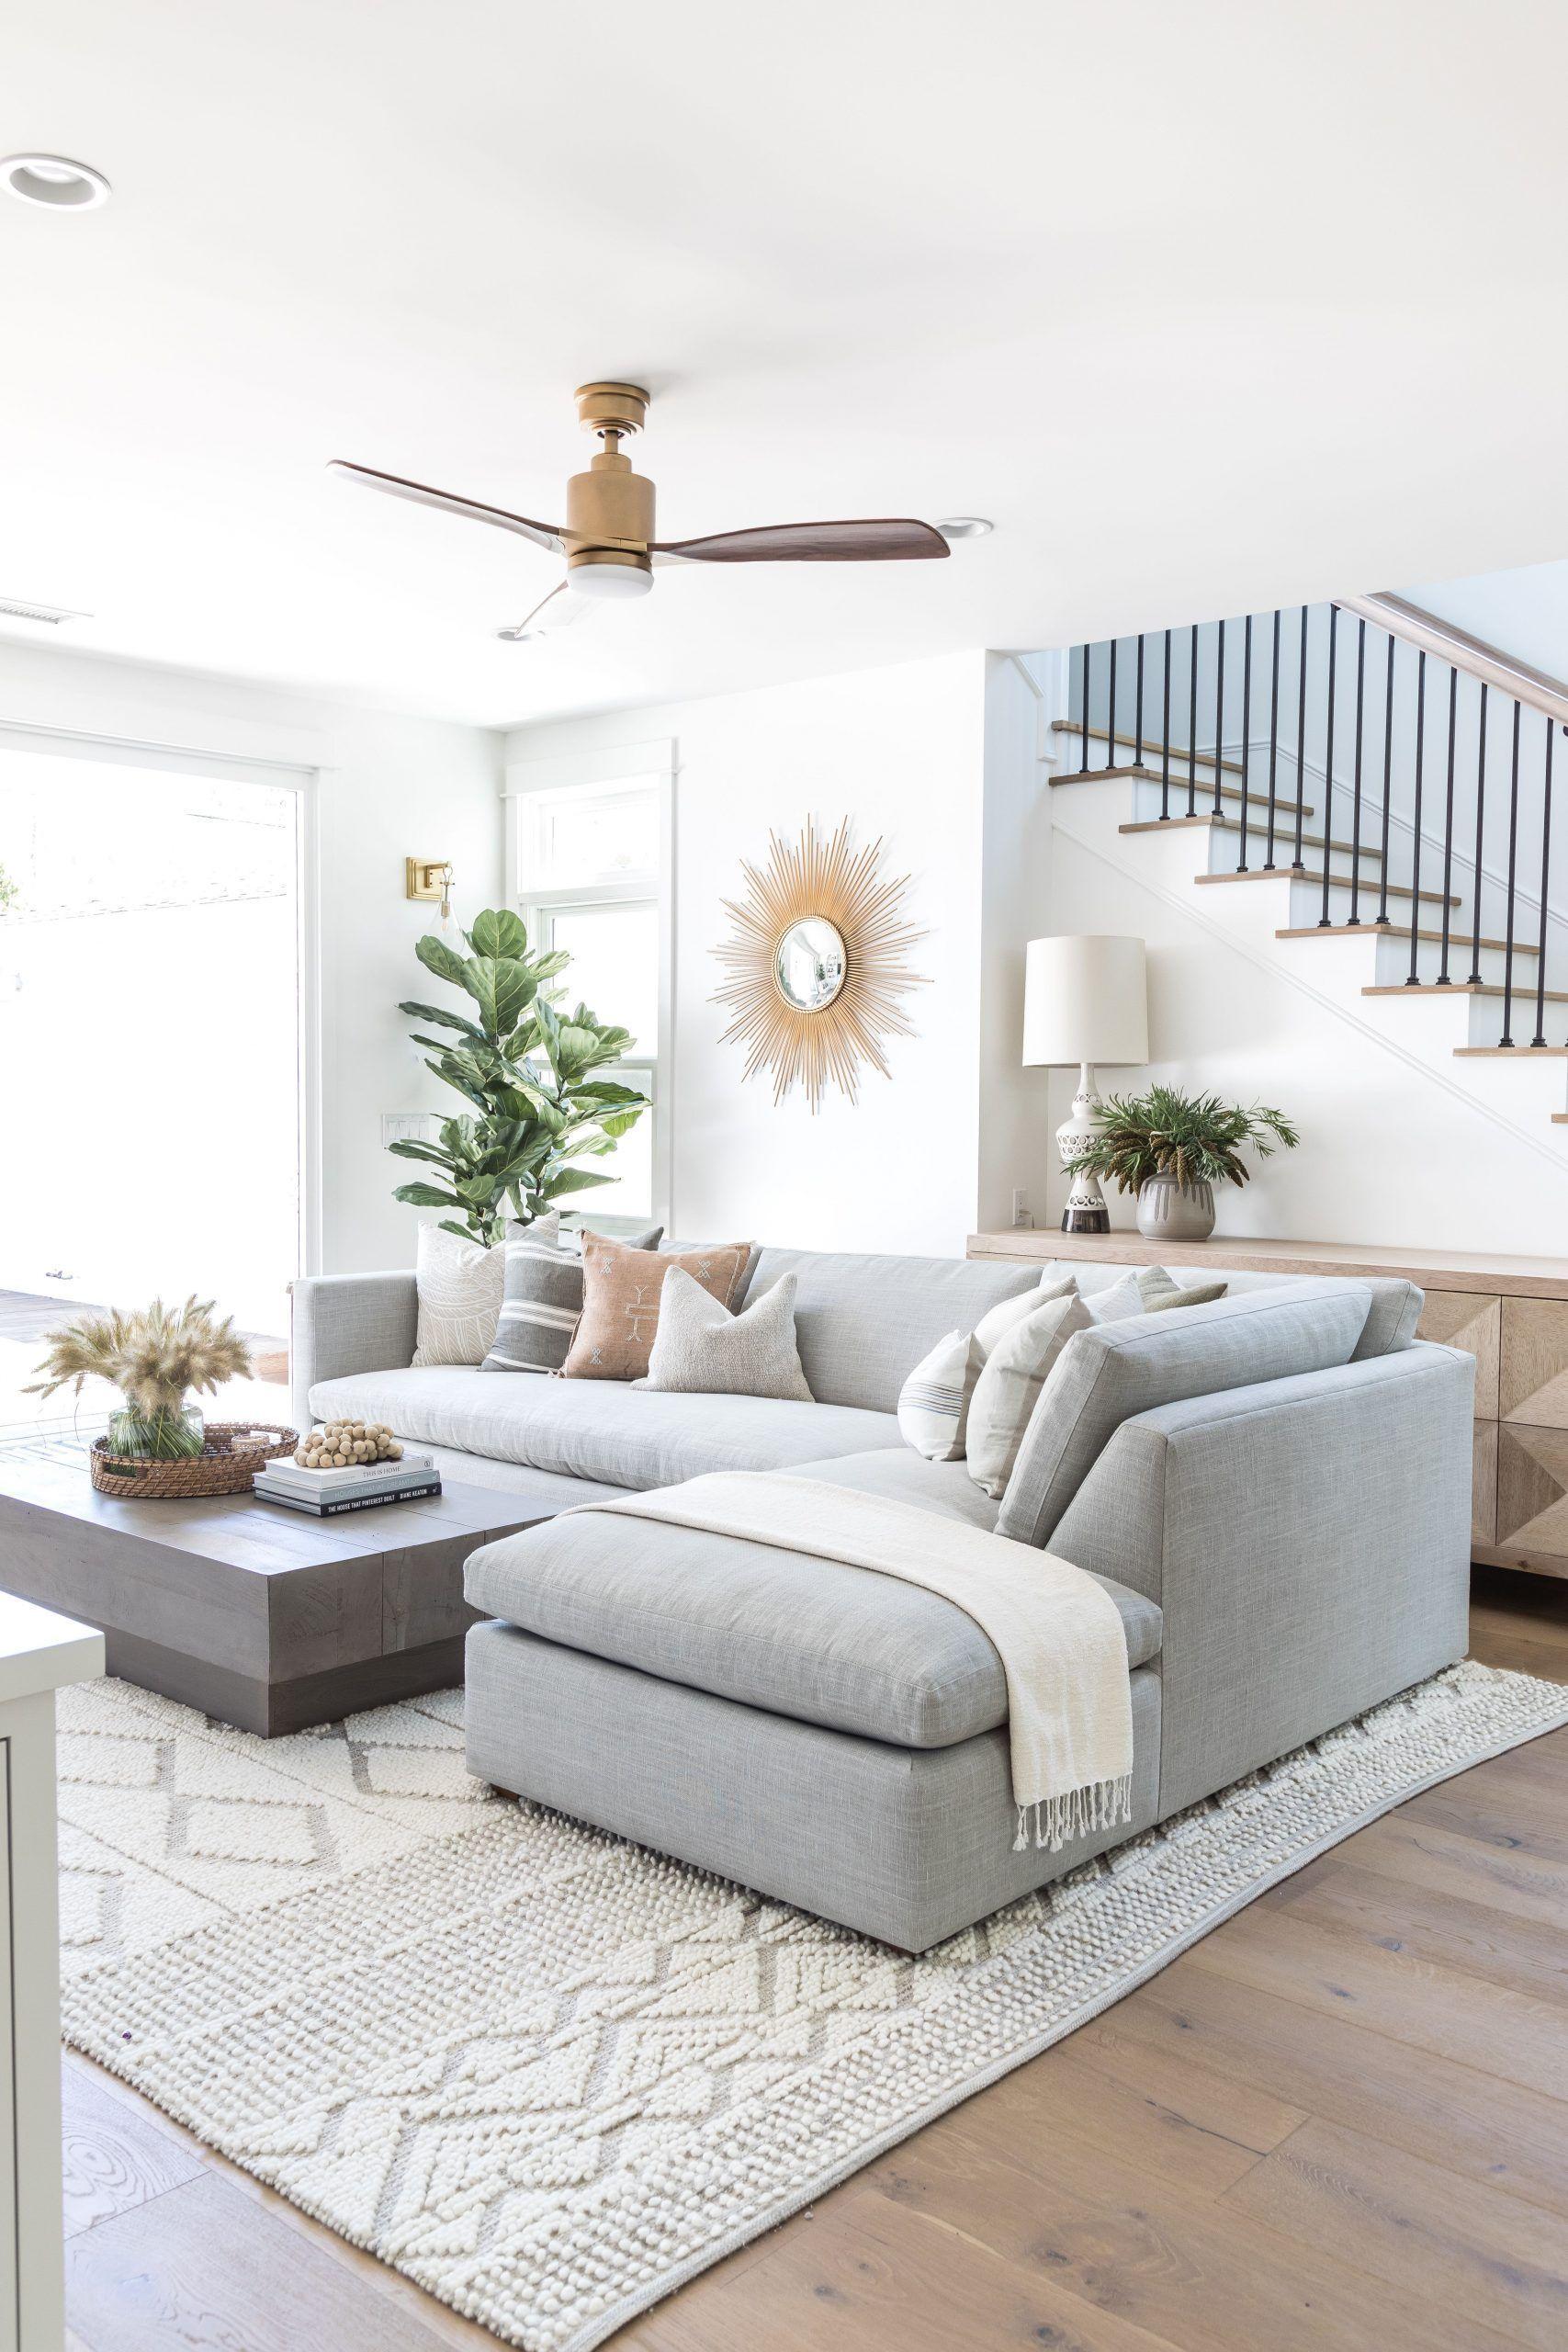 Comfortable Living Room In 2020 Living Room Decor Apartment Living Room Scandinavian Living Room Design Modern